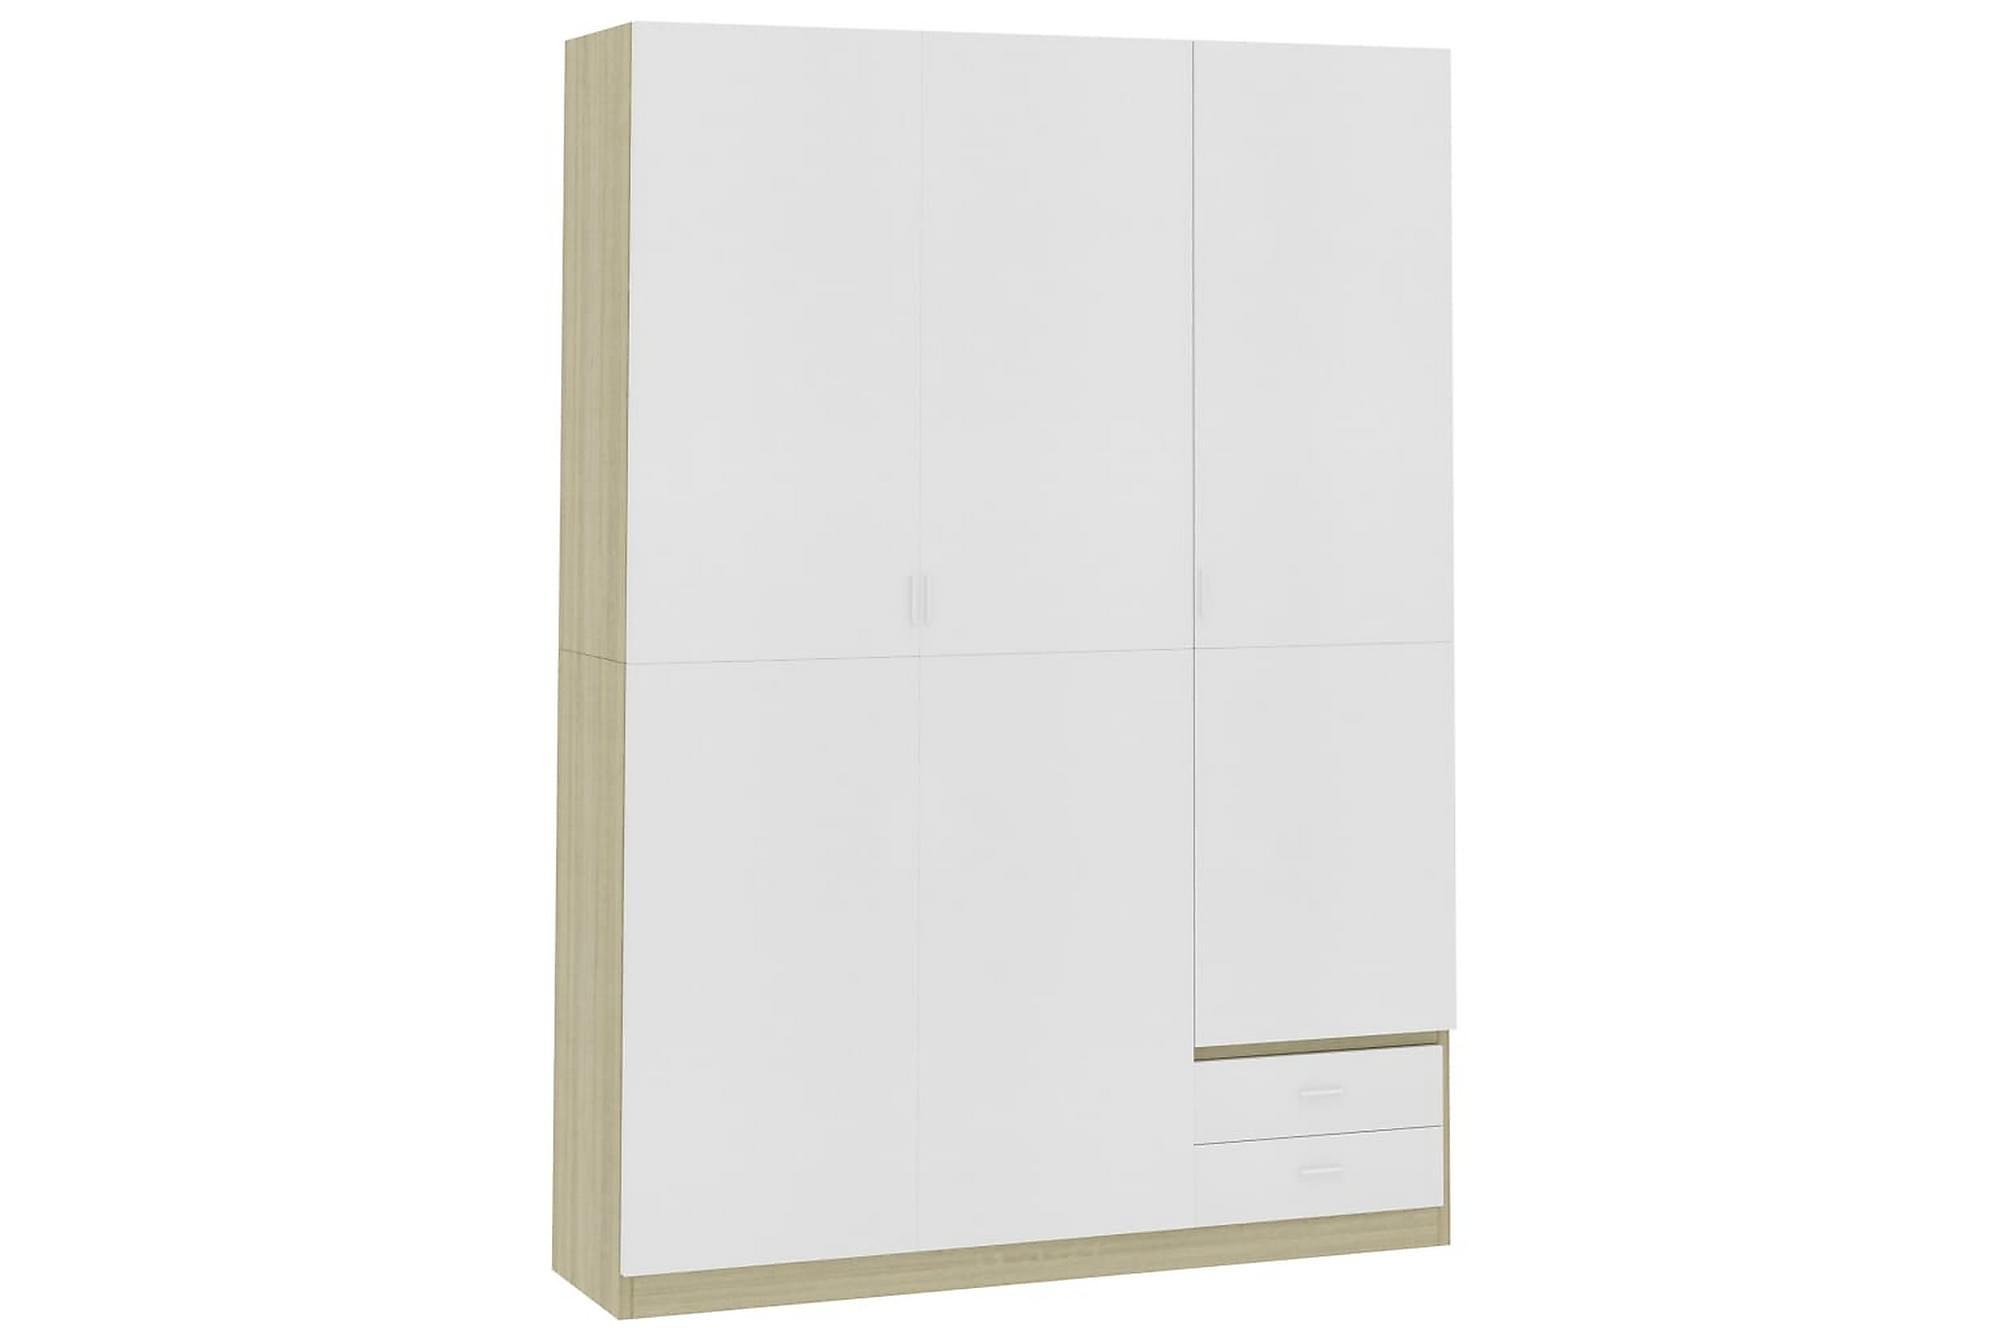 Garderob 3 dörrar vit och sonoma-ek 120x50x180 cm spånskiva